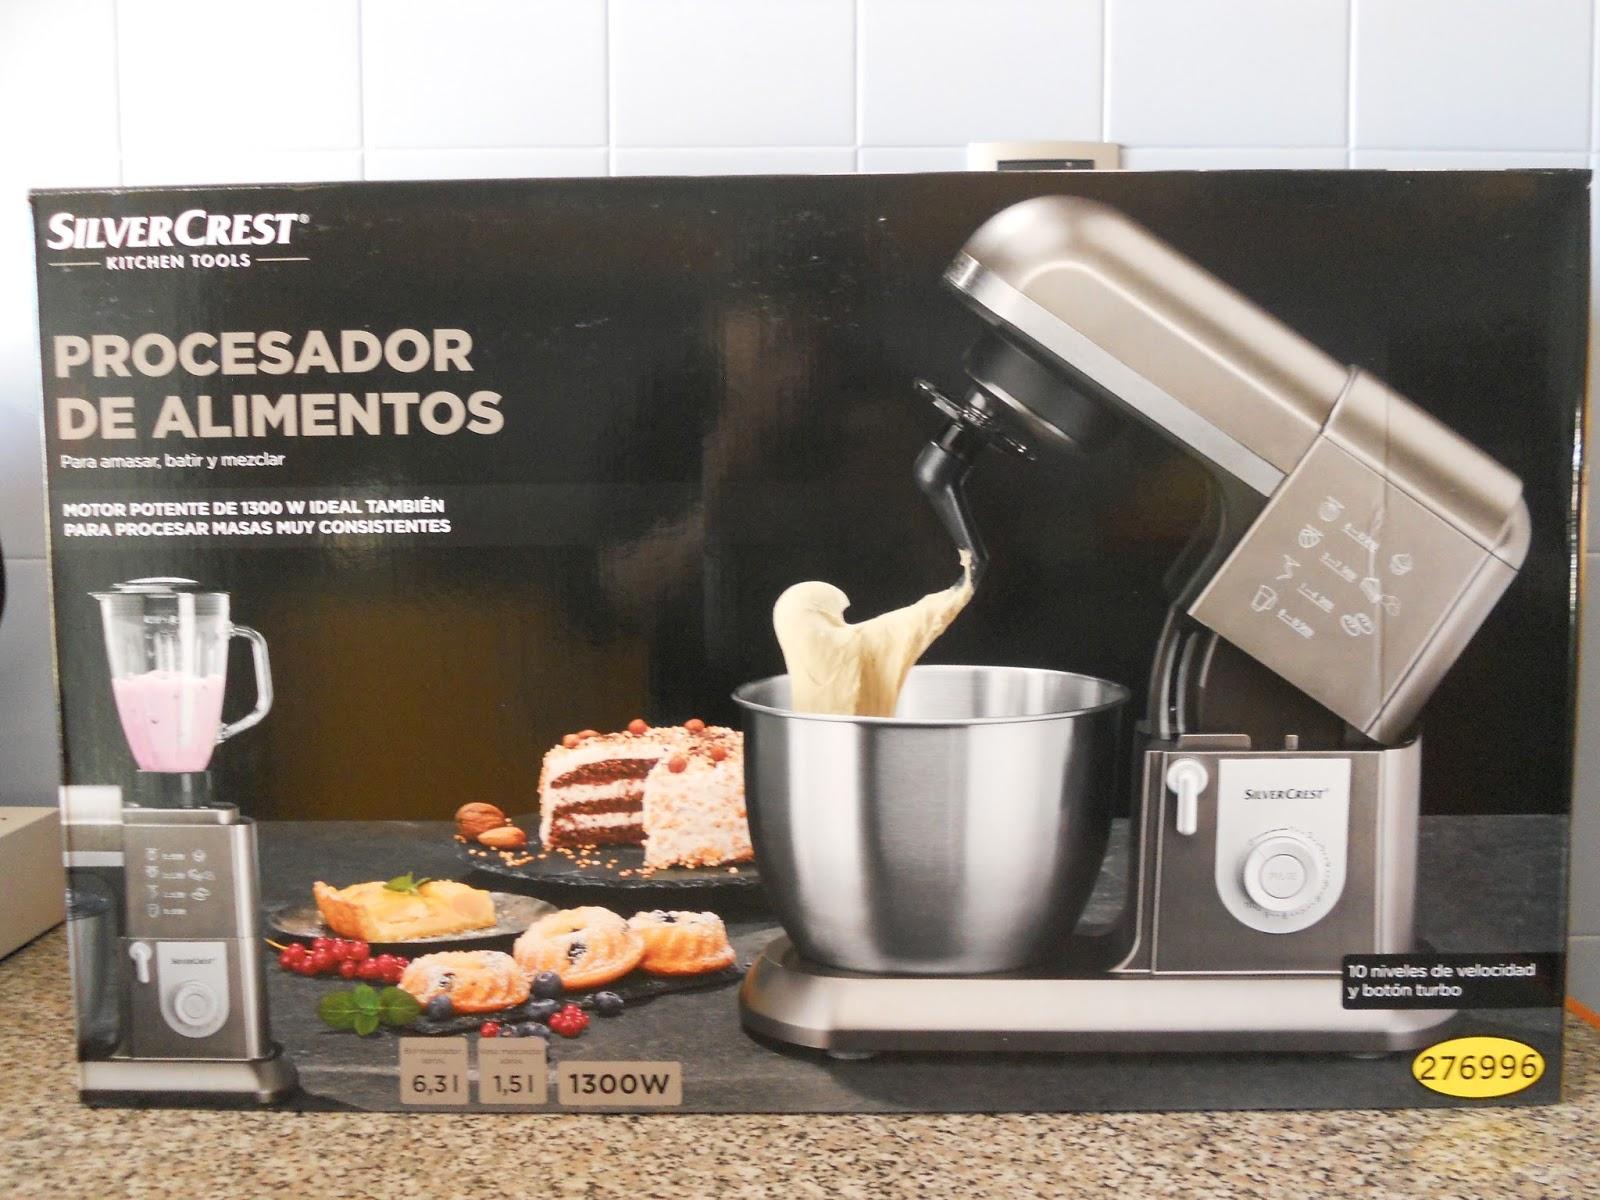 New in robot de cozinha silvercrest - Robot de cocina silvercrest lidl ...